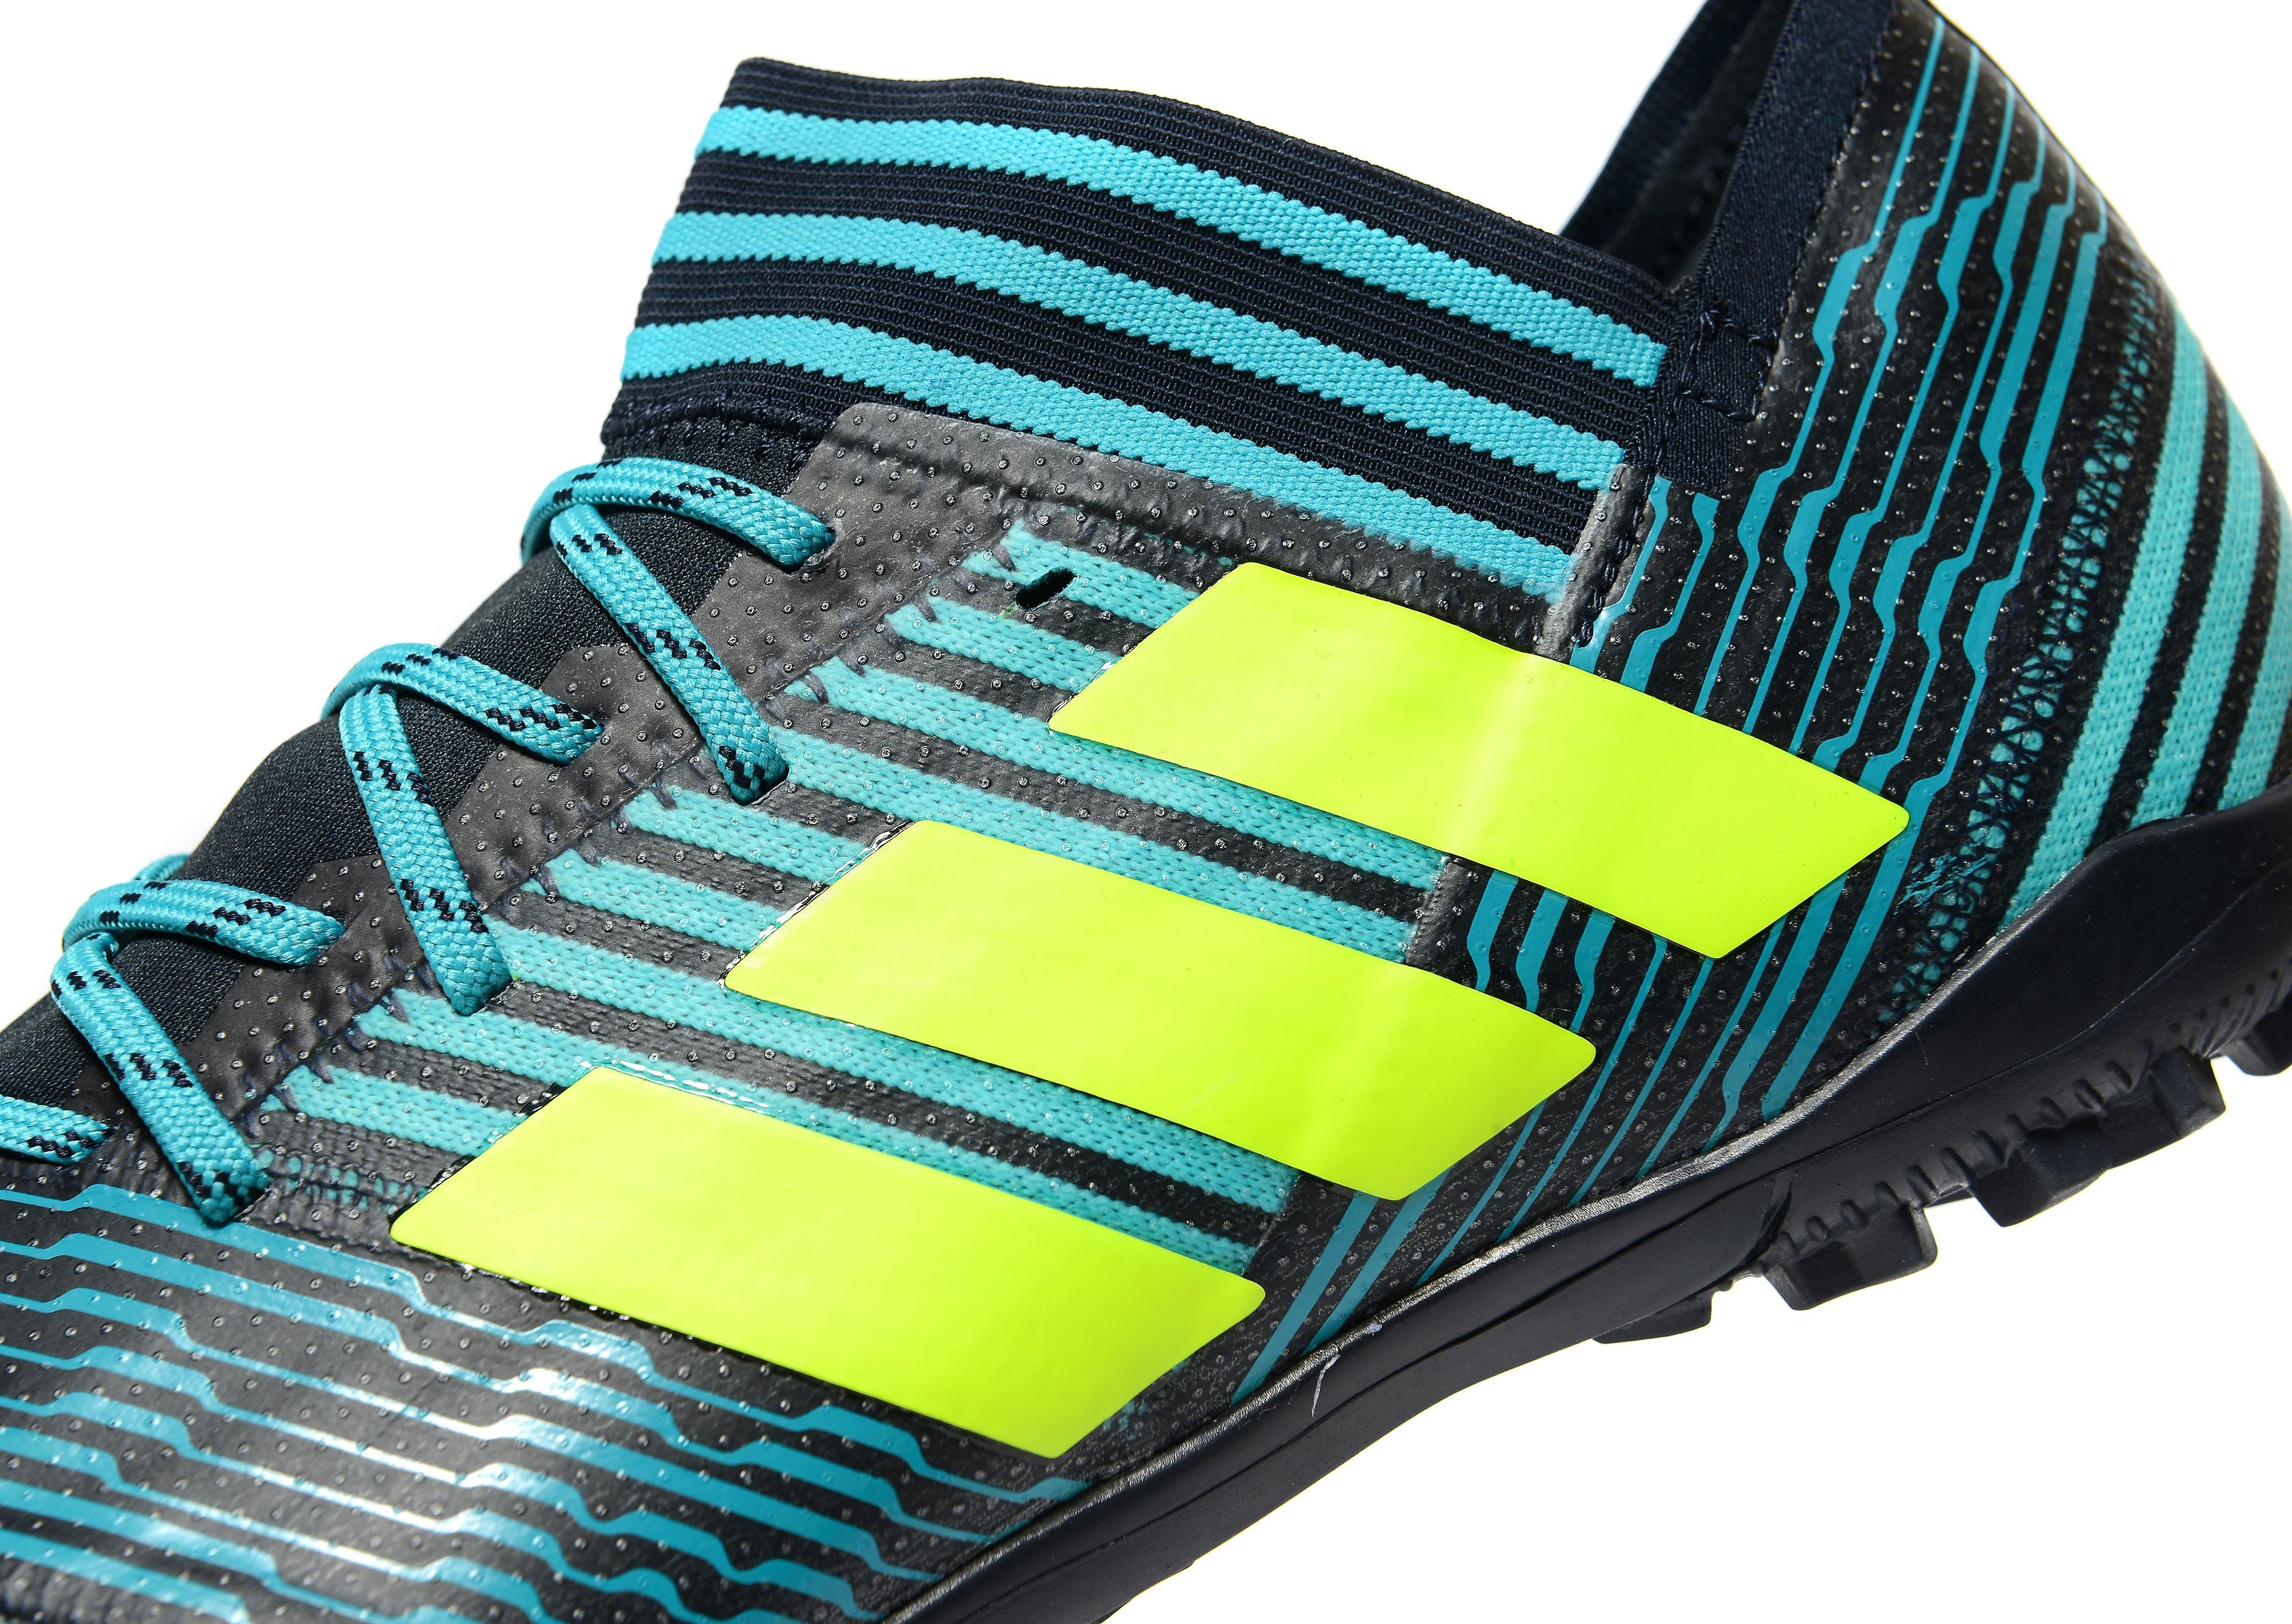 adidas Ocean Storm Nemeziz 17.3 Turf